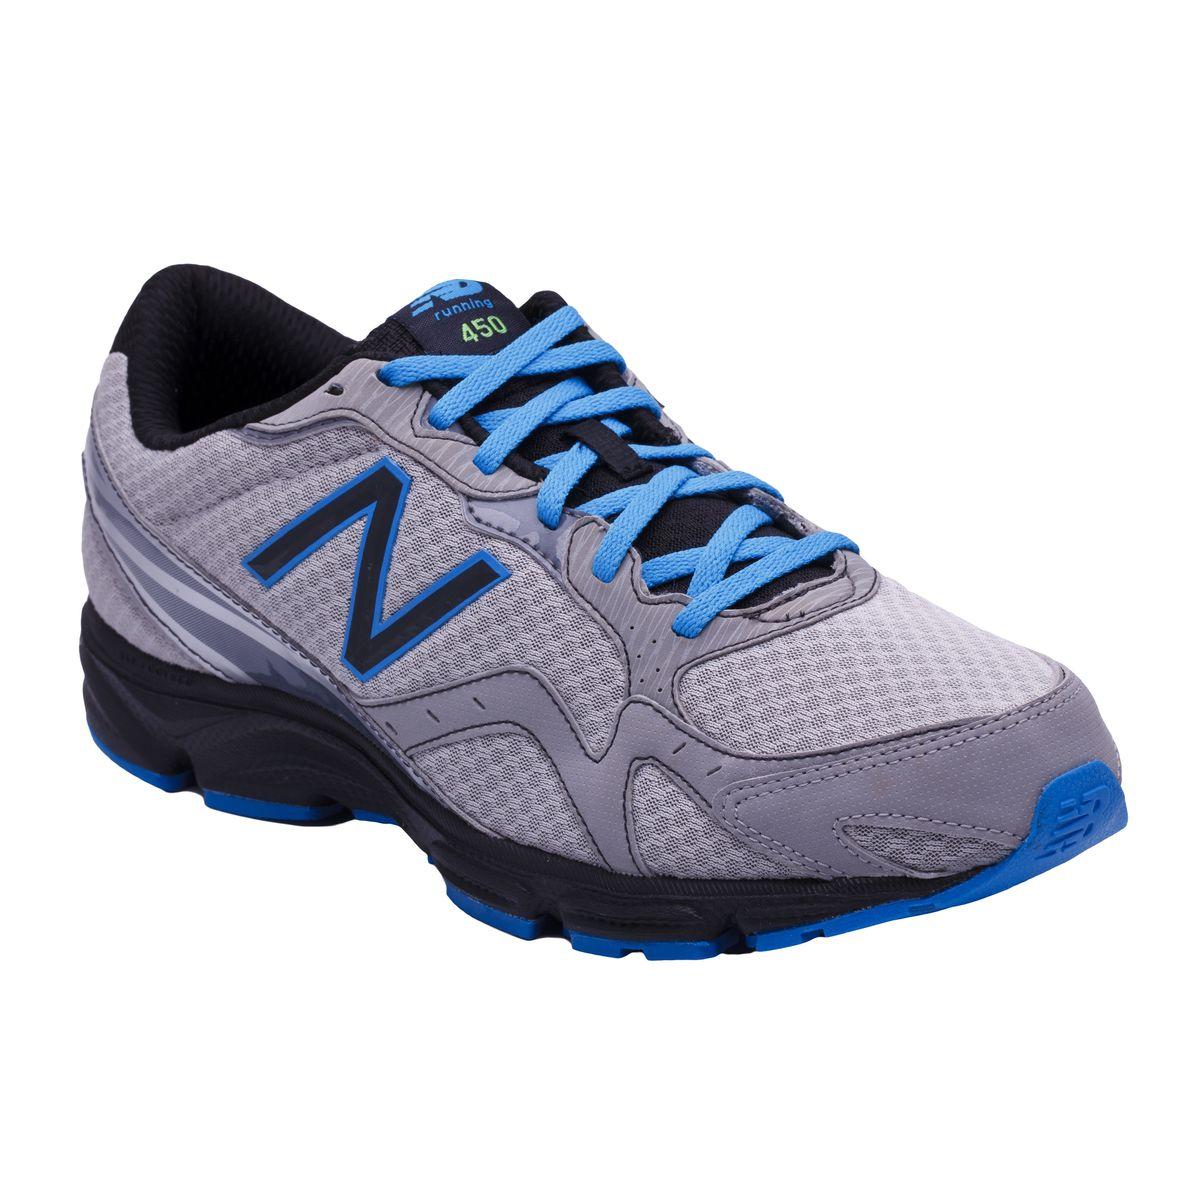 chaussures course asics pas cher - new balance 450